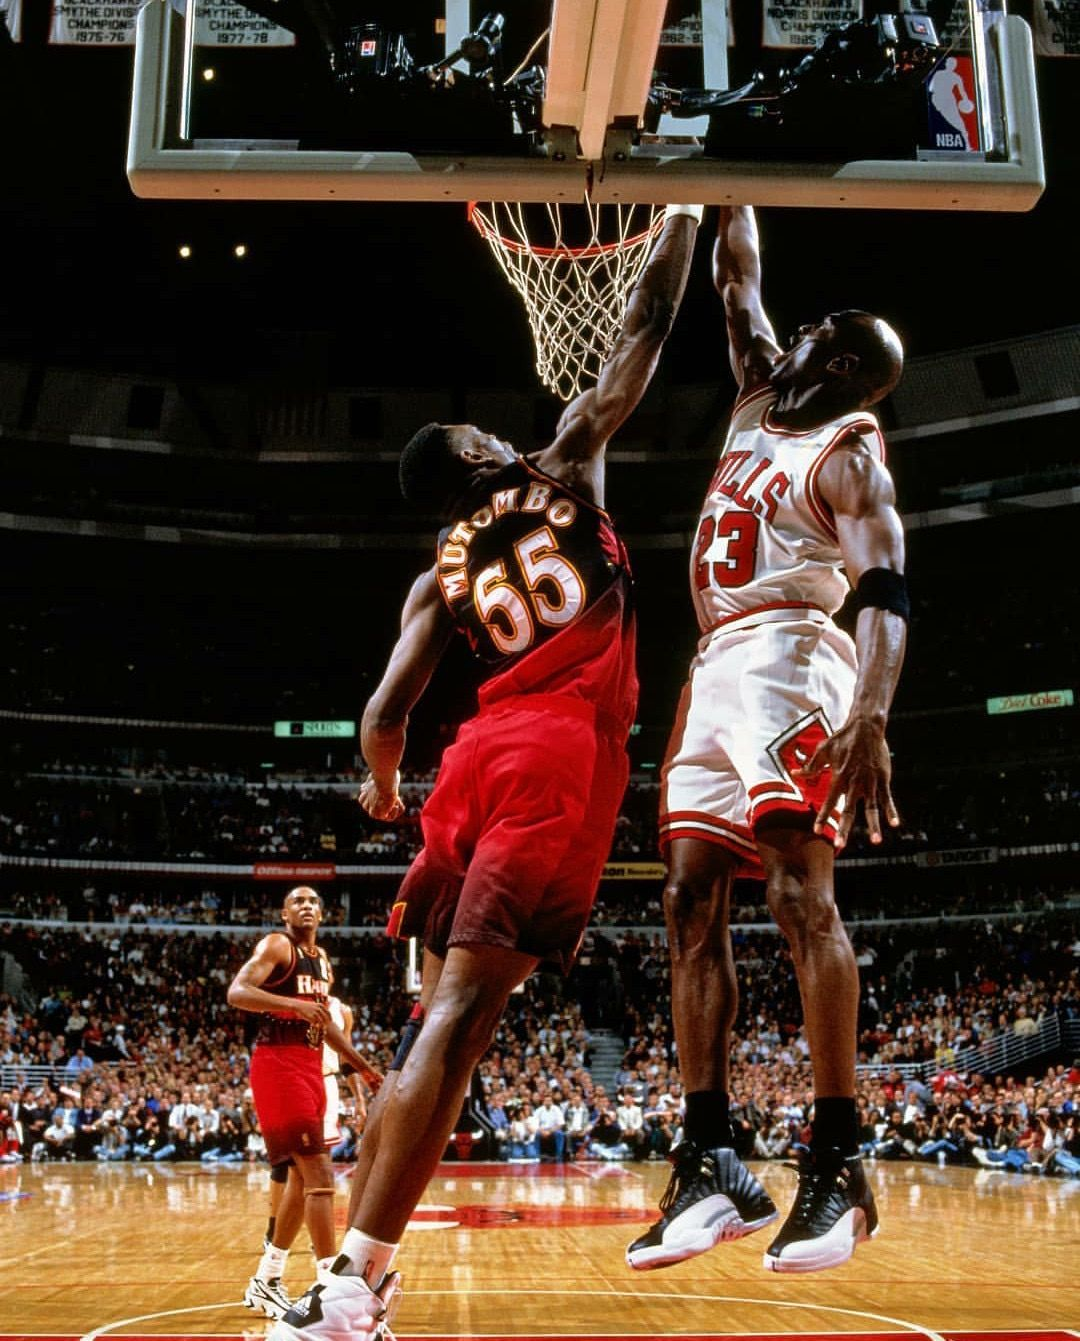 Michael Jordan climbs Mount mutombo | Jordans | Michael